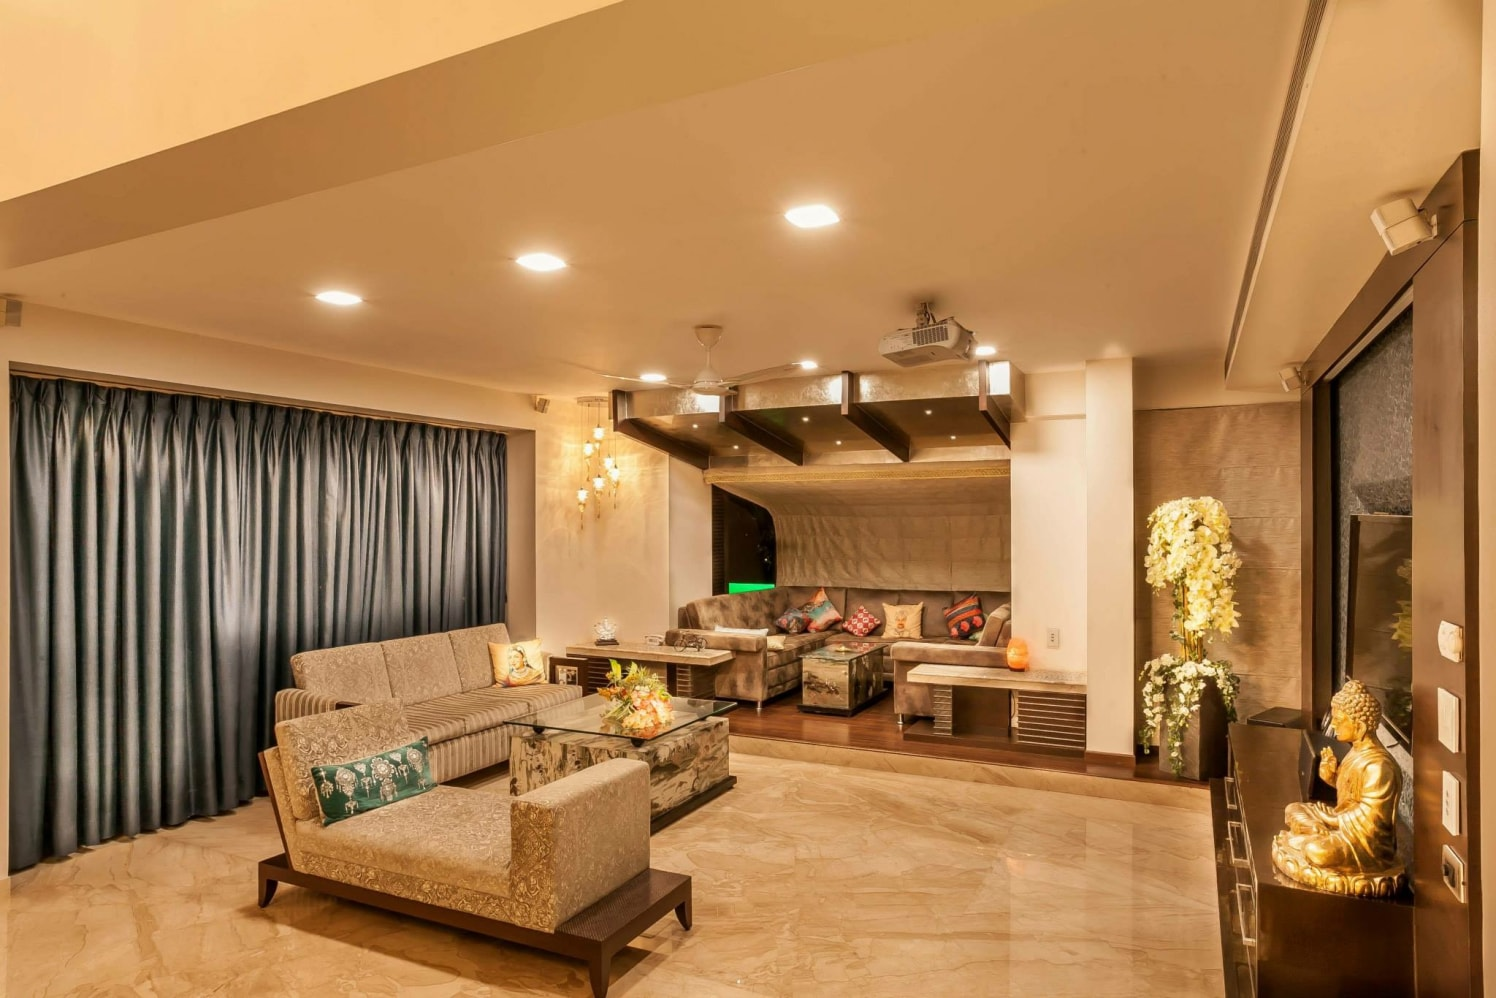 Regal gold theme living room decor by Blue Arch Interiors Living-room | Interior Design Photos & Ideas